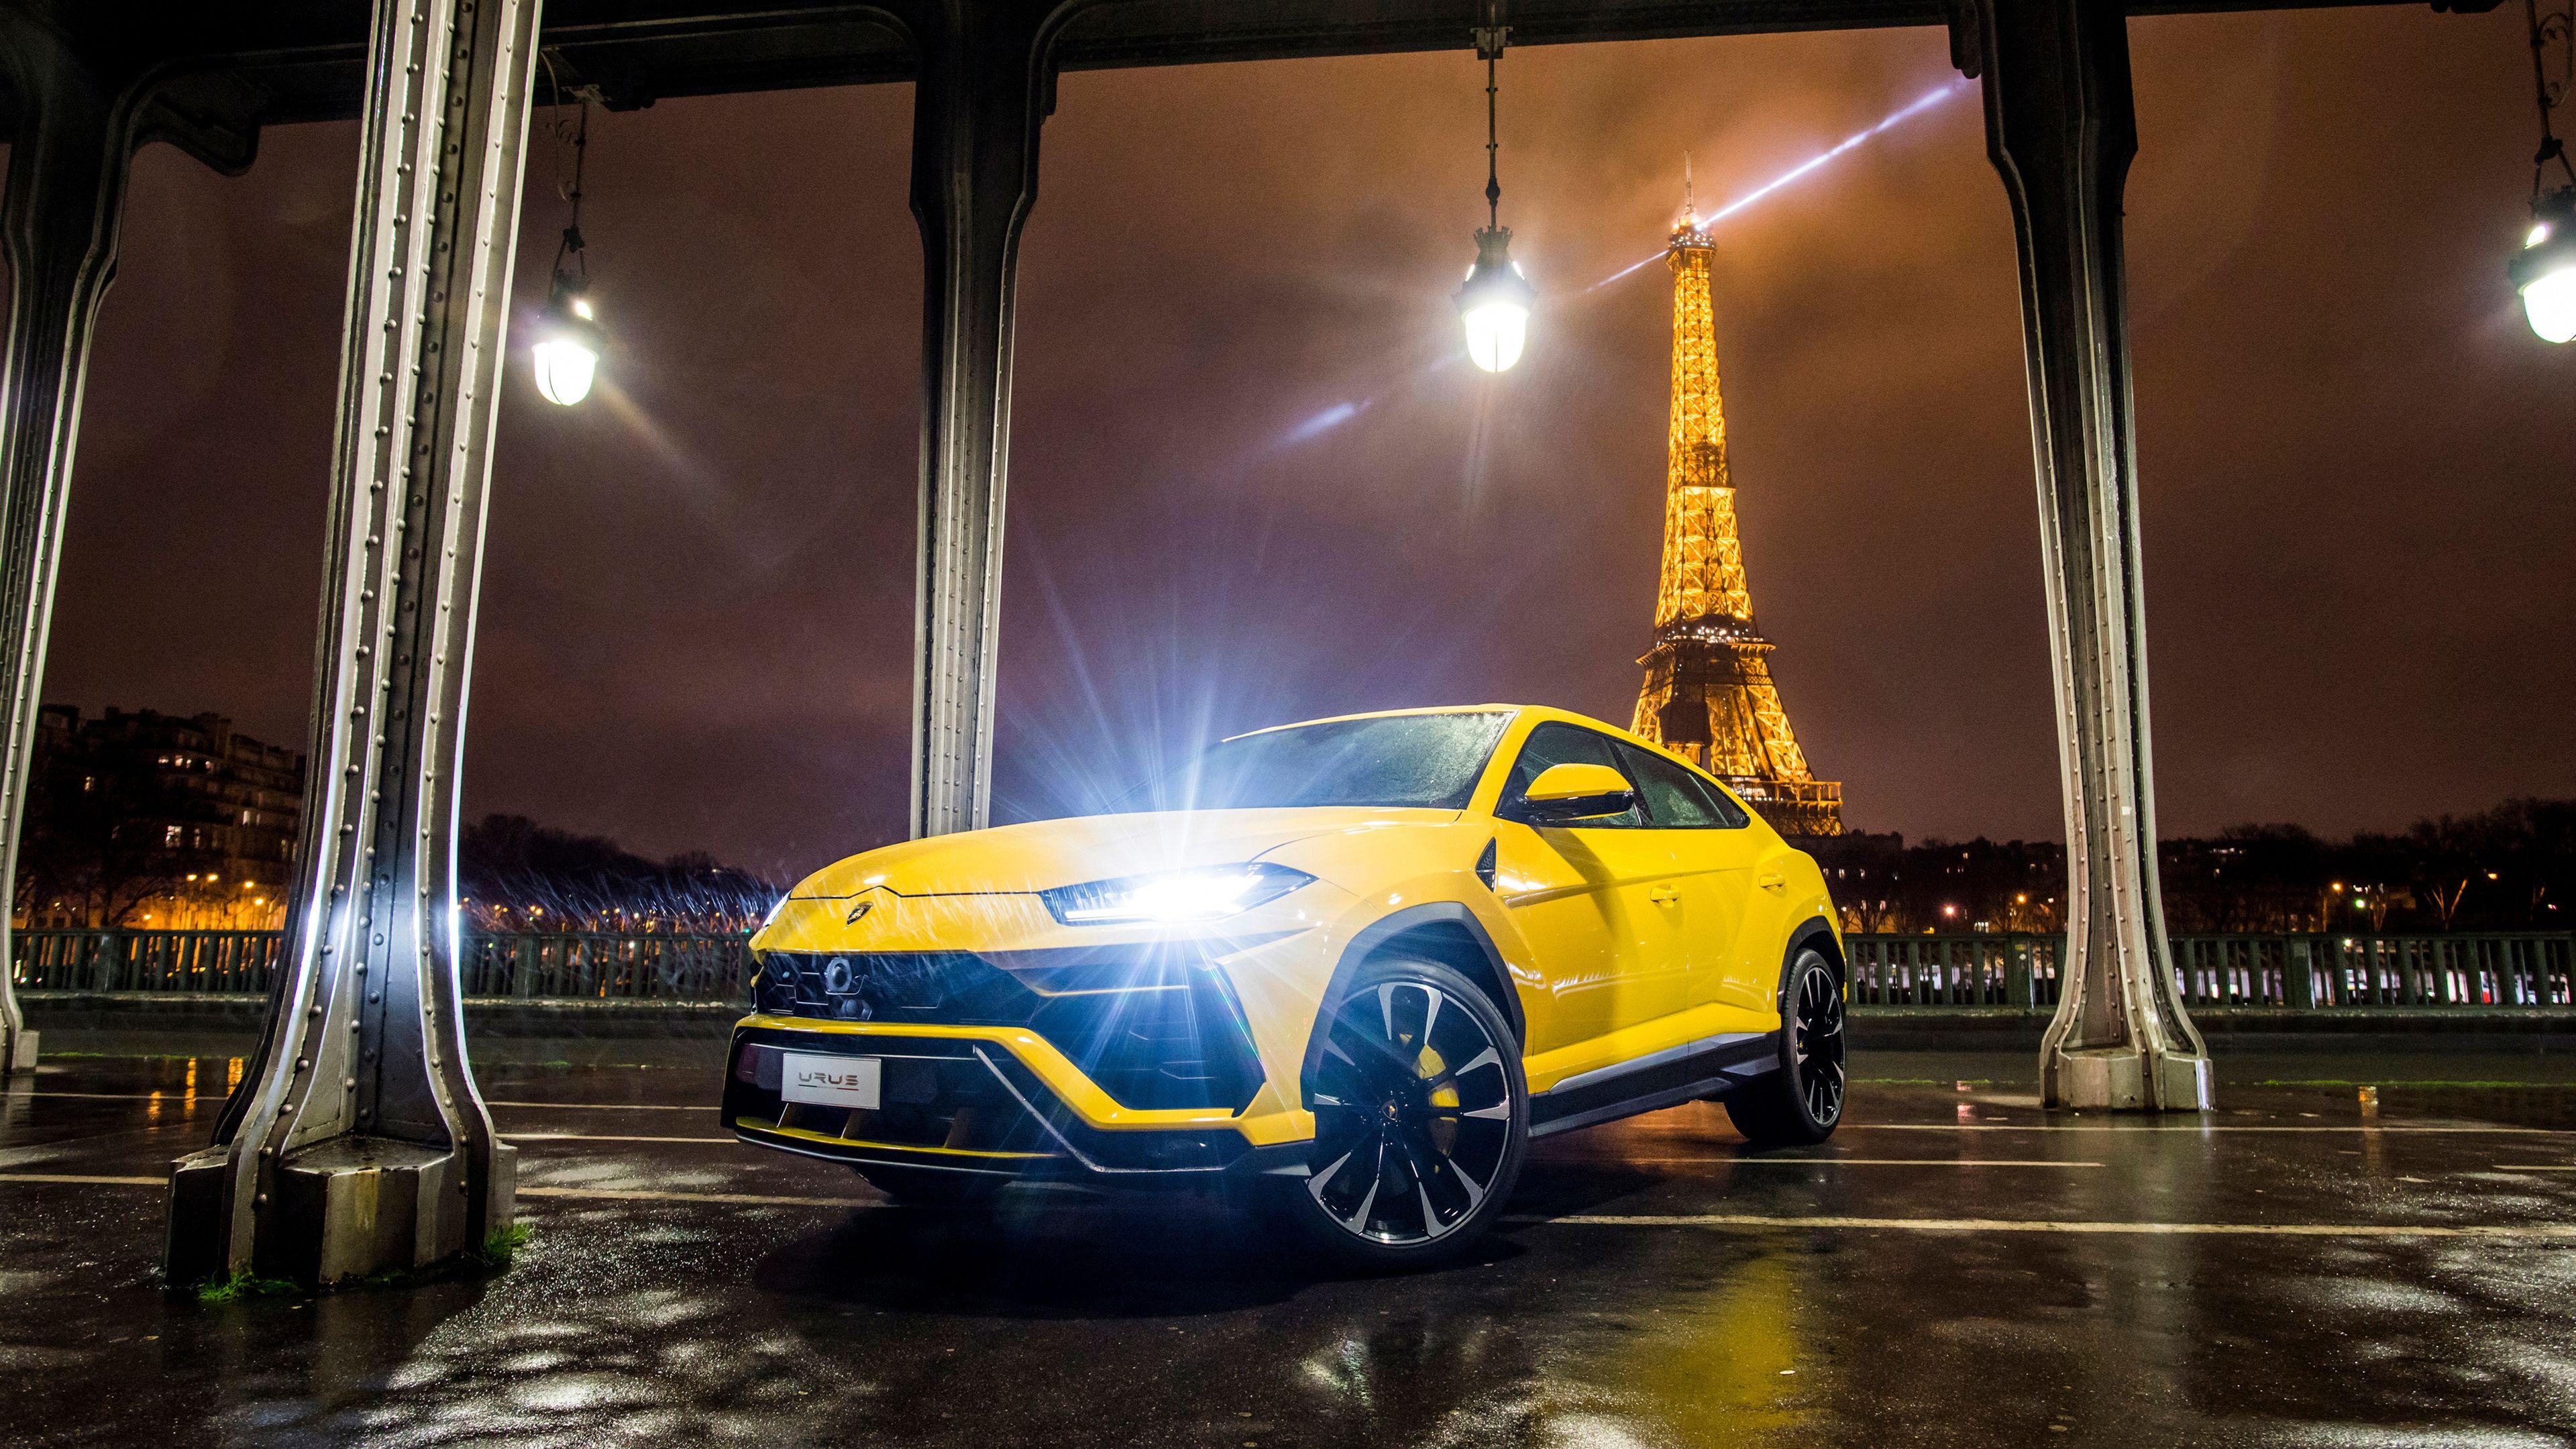 Wallpaper 4k Lamborghini Urus 2018 2018 Cars Wallpapers 4k